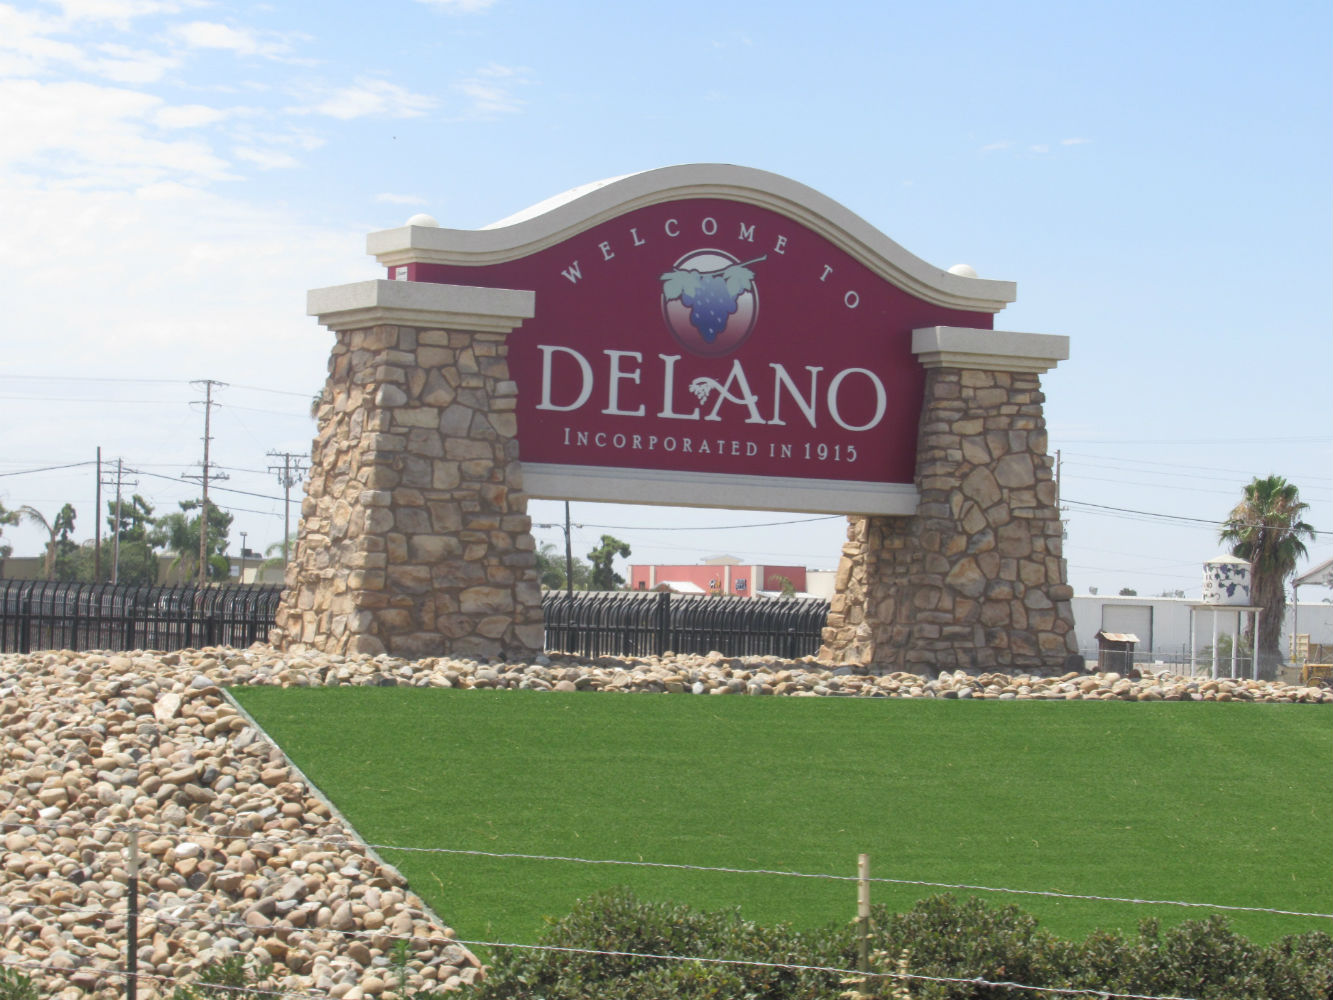 Anabel perez allstate insurance coupons near me in delano for Delano promo code